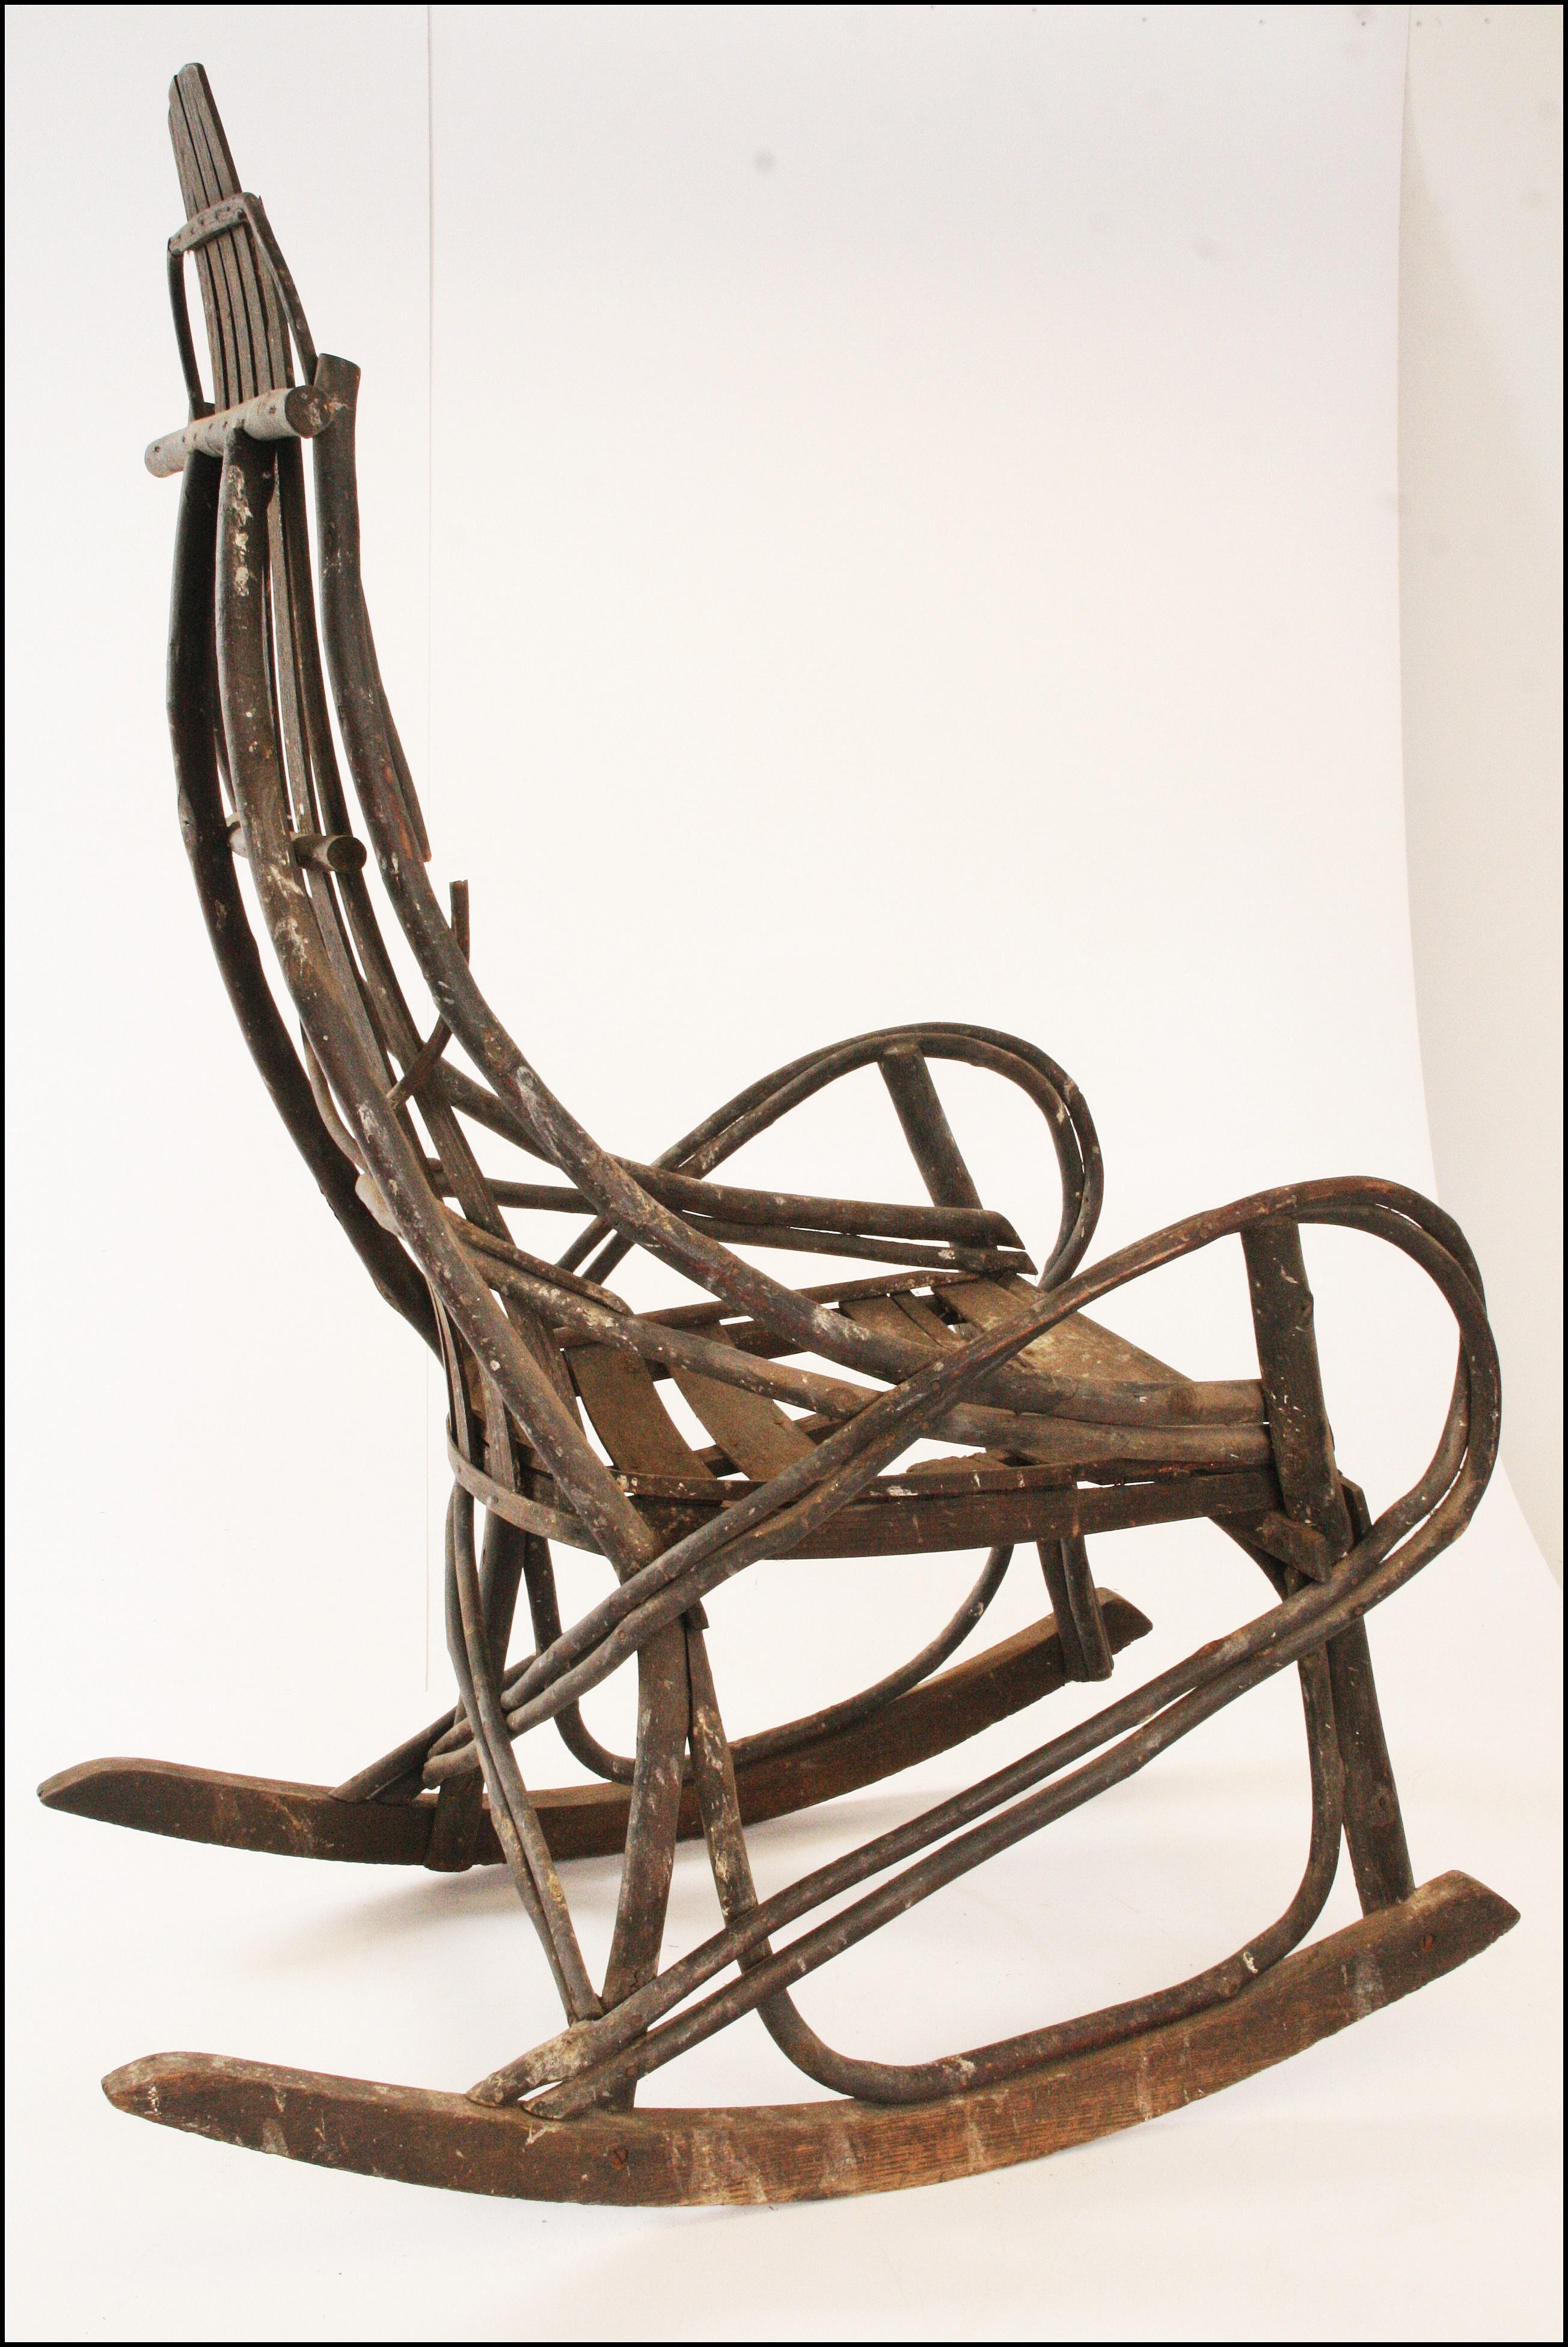 Vintage Adirondack Handmade Wood Rocking Chair - Image 7 of 11  sc 1 st  Chairish & Vintage Adirondack Handmade Wood Rocking Chair | Chairish